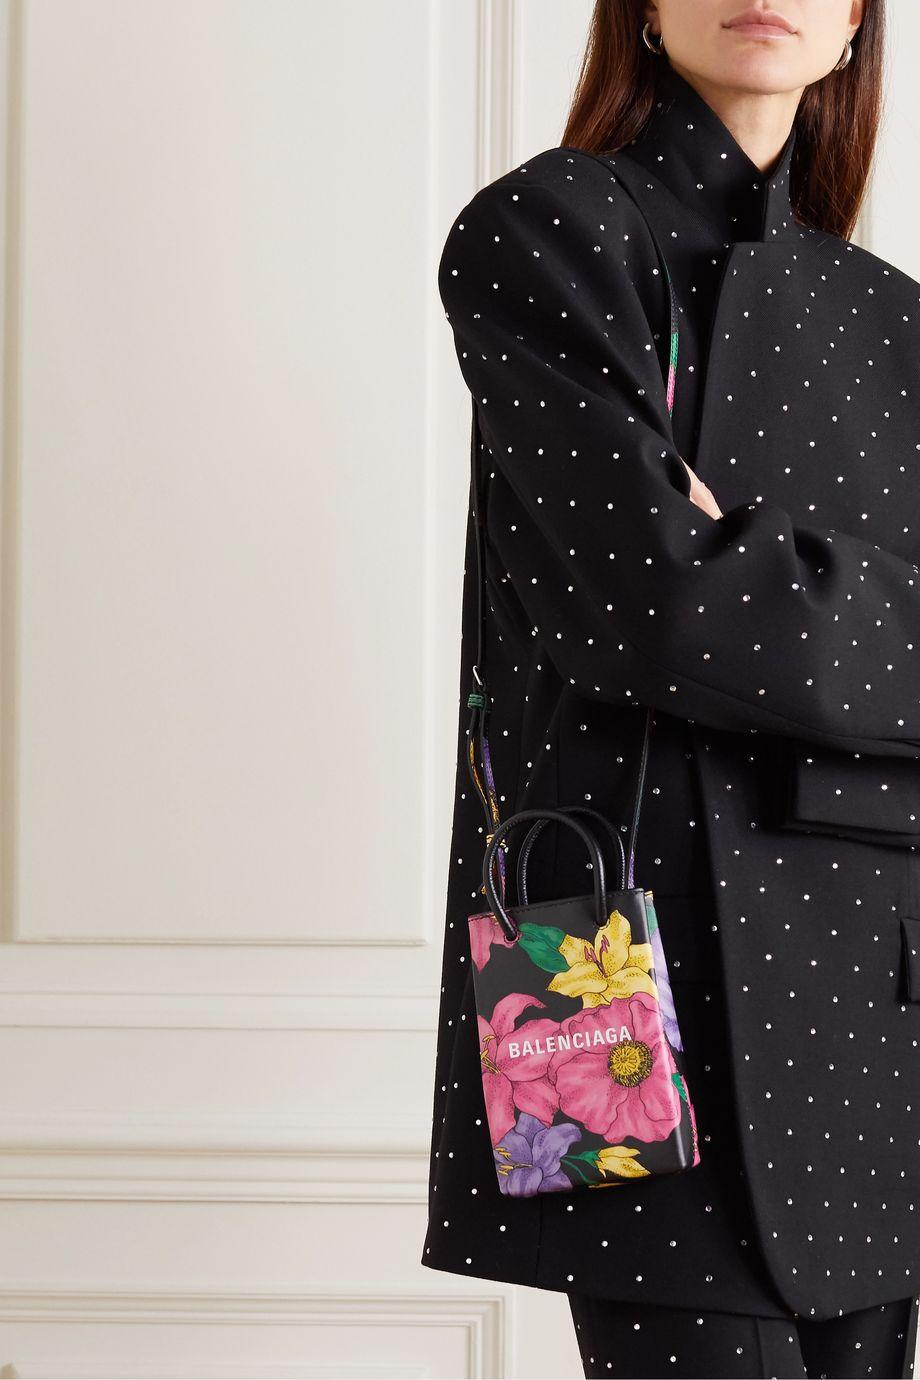 Balenciaga Shopping mini floral-print textured-leather shoulder bag